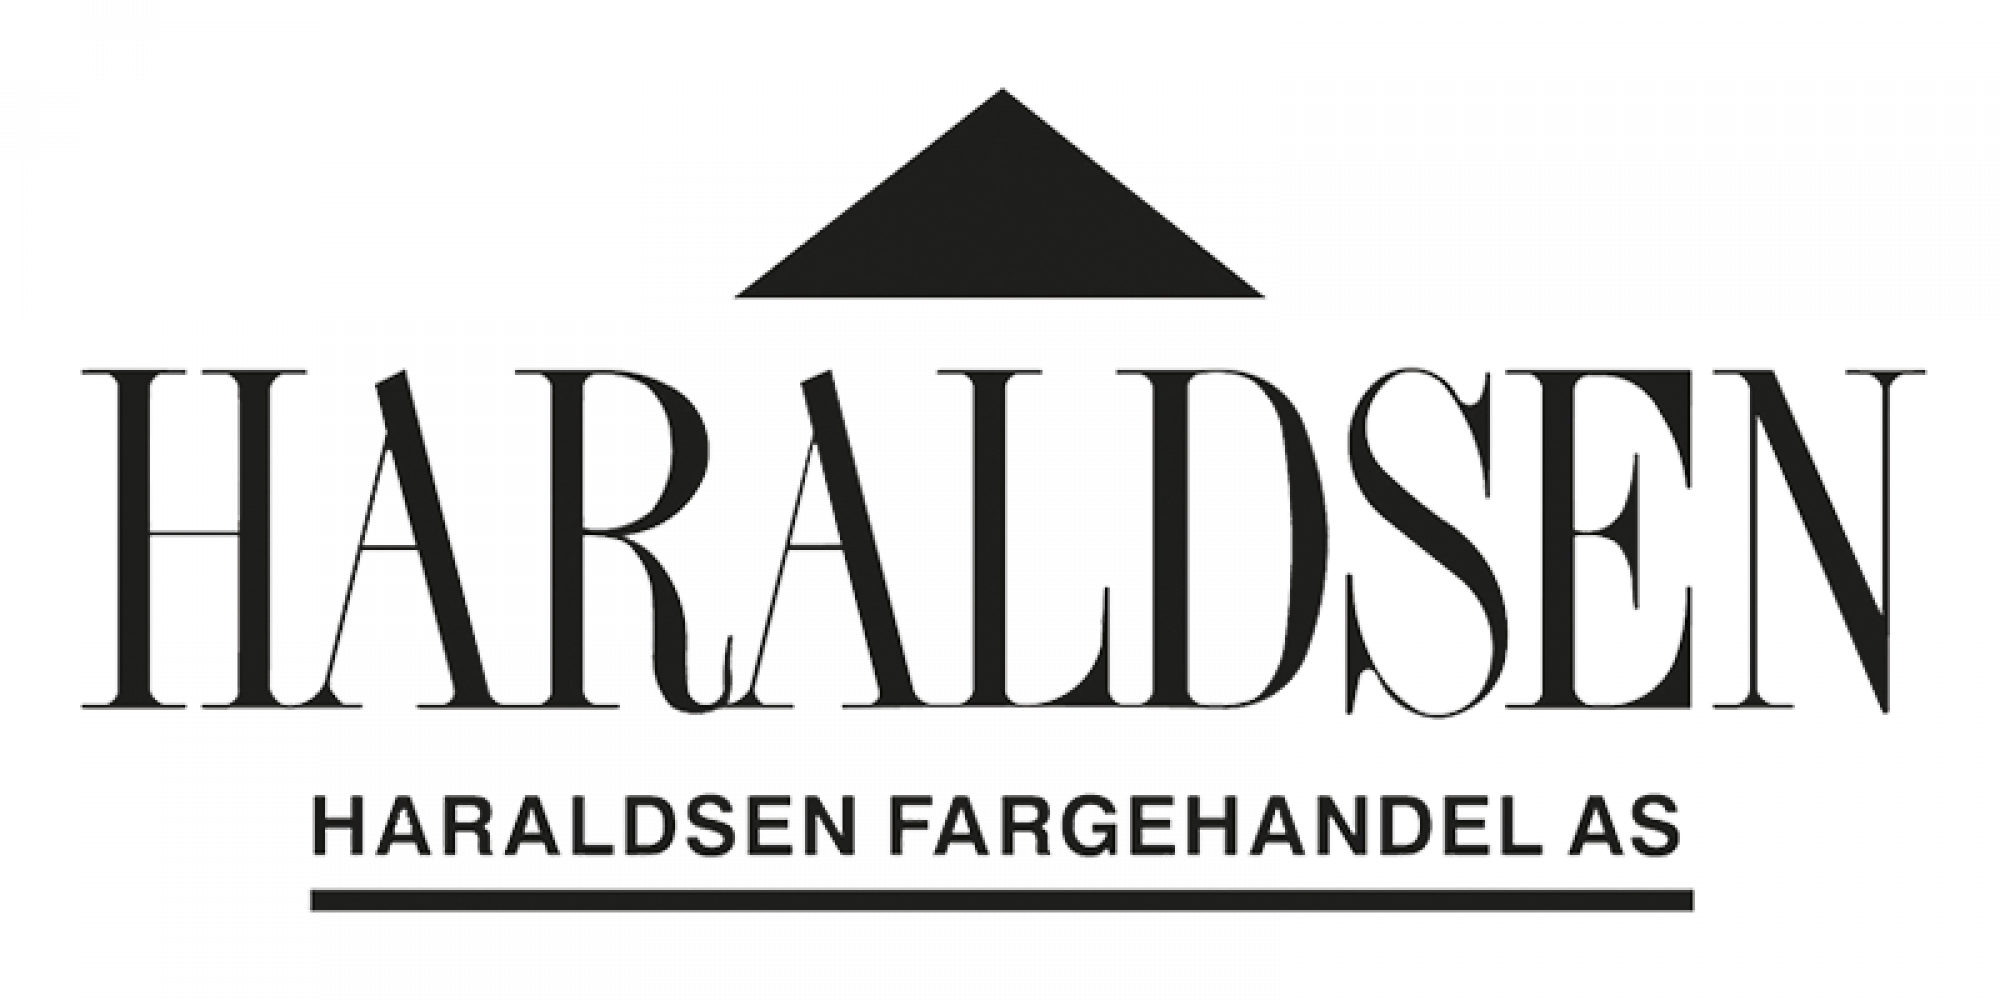 Knut Haraldsens Farvehandel A/S